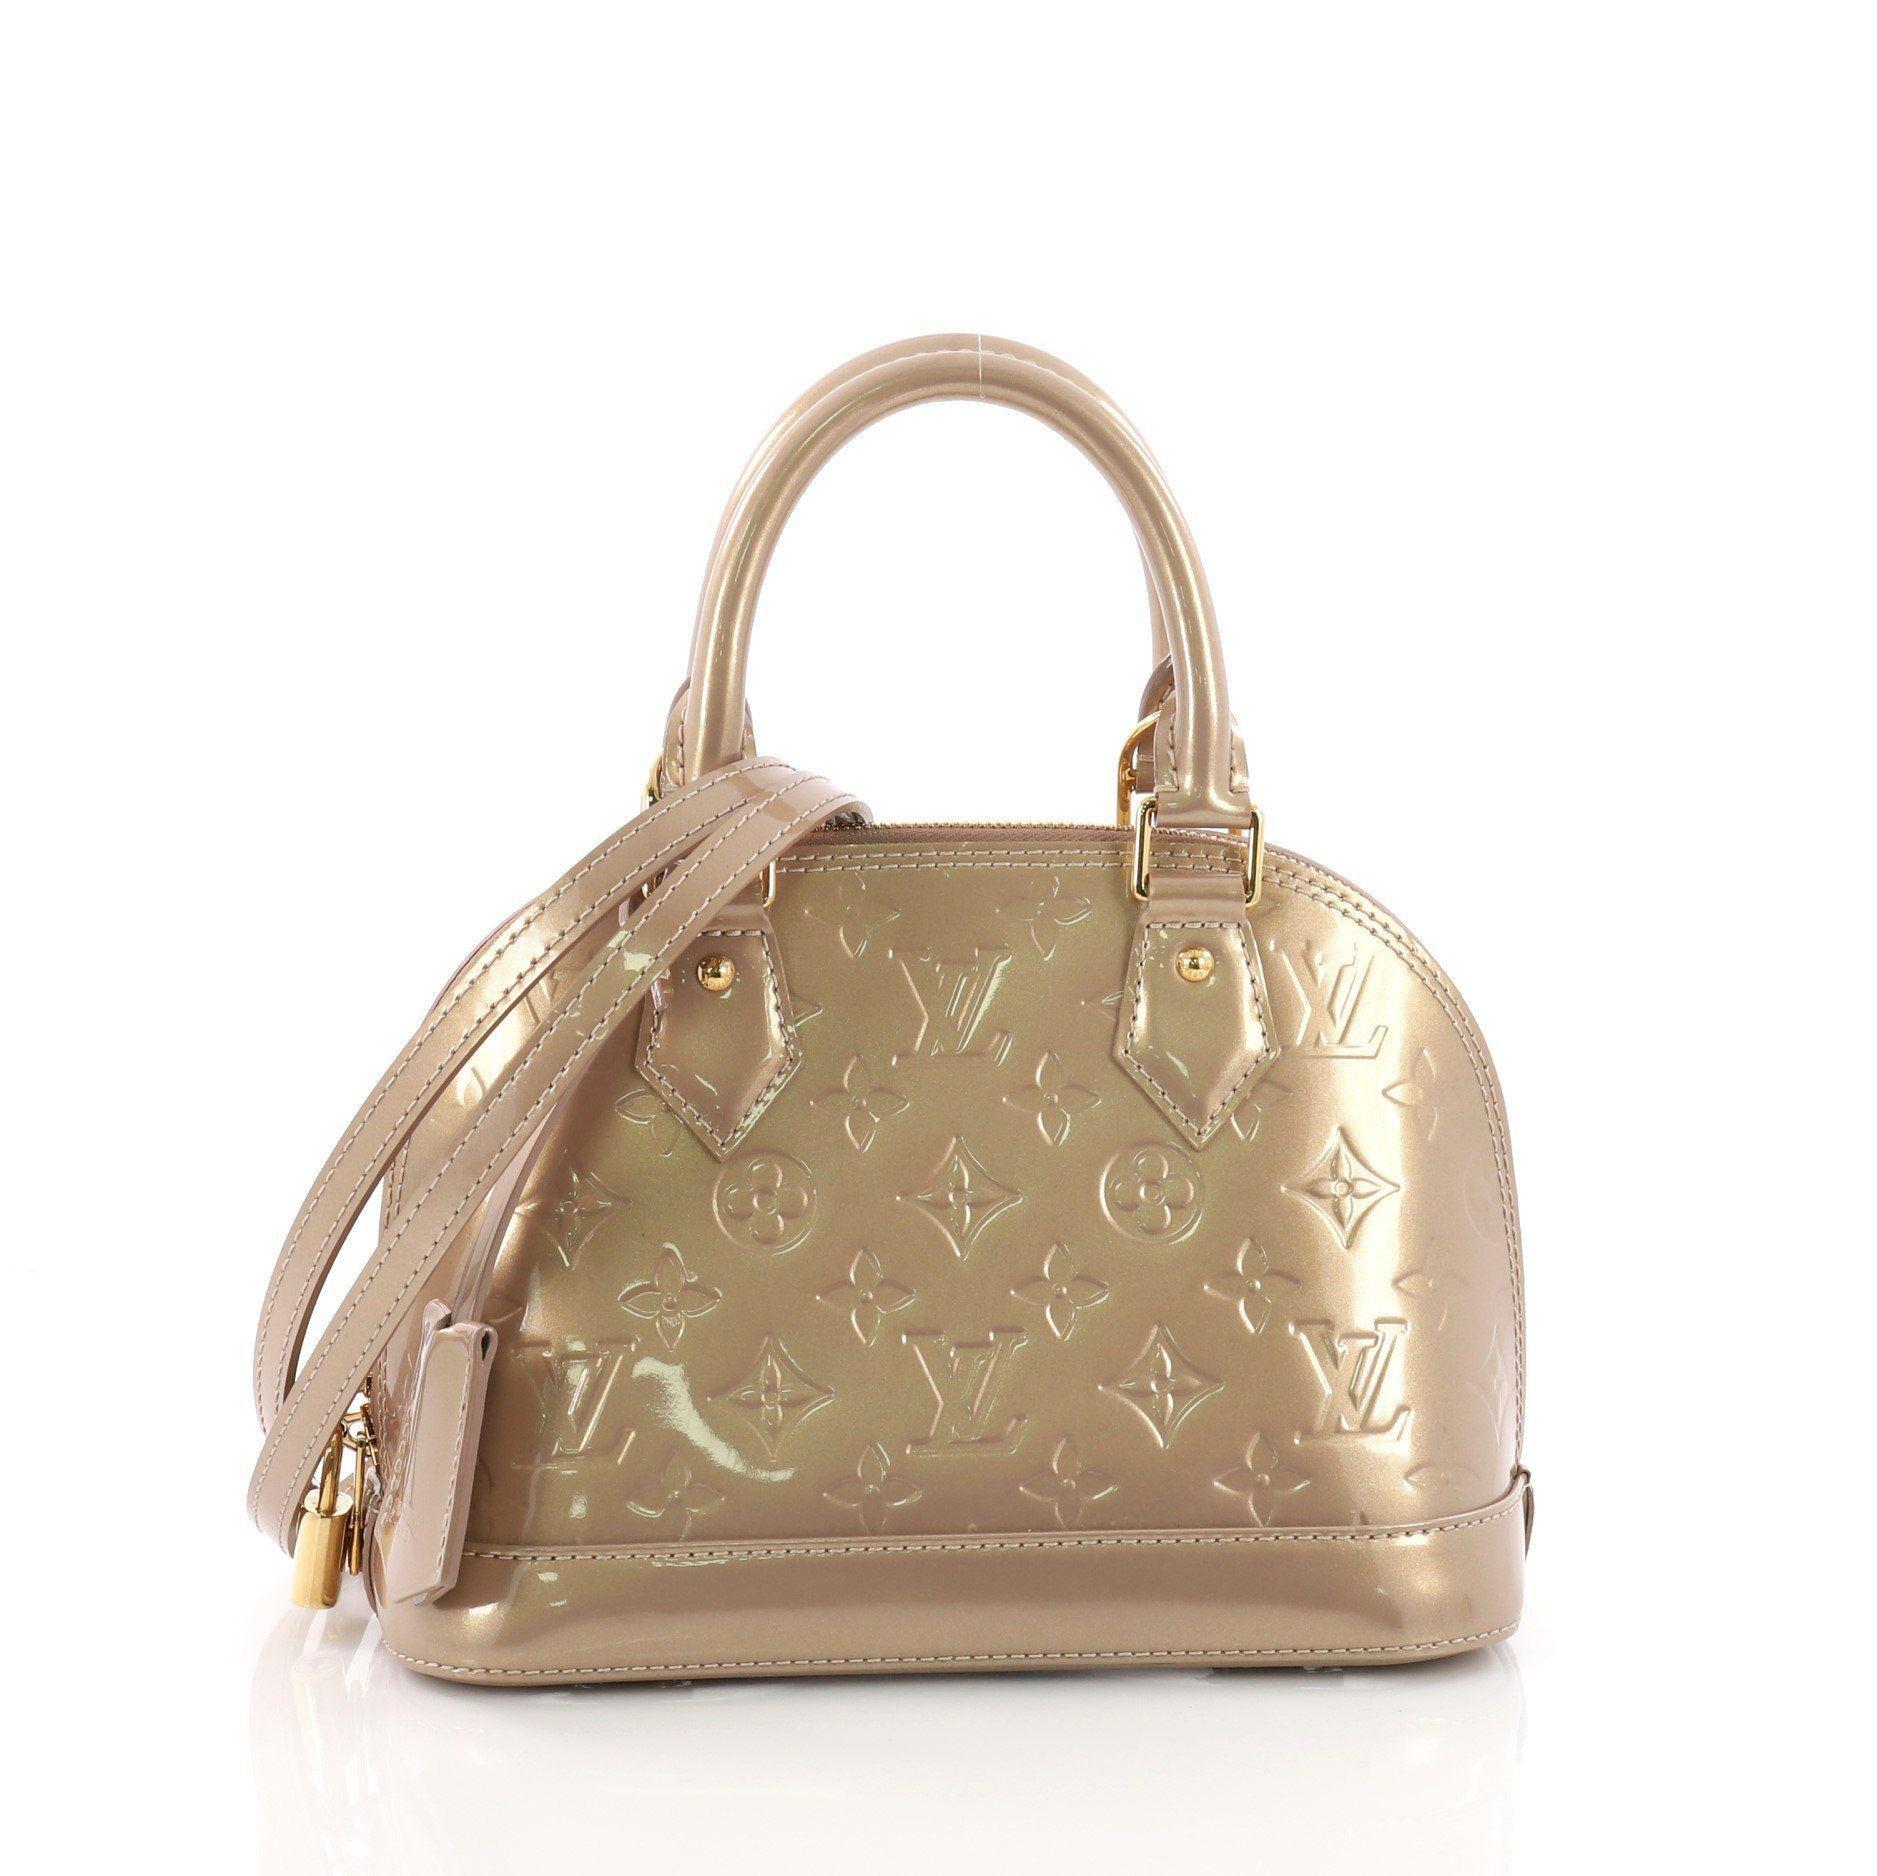 9c26f7e2a02 Lyst - Louis Vuitton Pre Owned Alma Handbag Monogram Vernis Bb